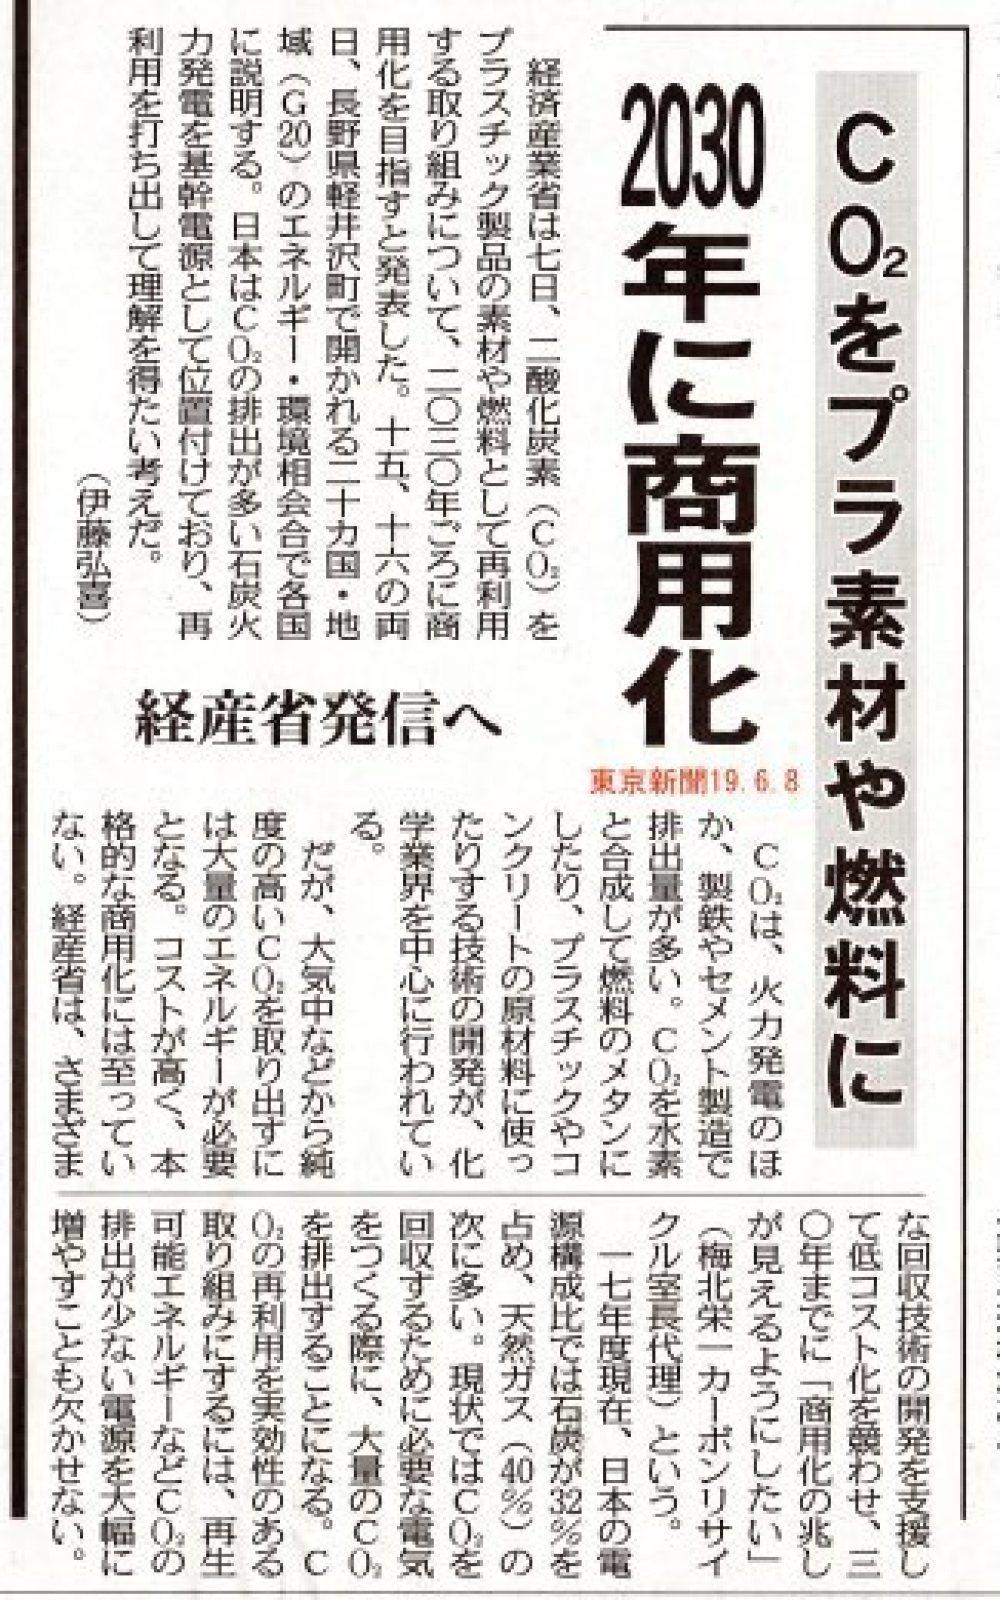 CO2をプラ素材や燃料に 2030年商品化 経産省発信へ  /  東京新聞 _b0242956_21230826.jpg